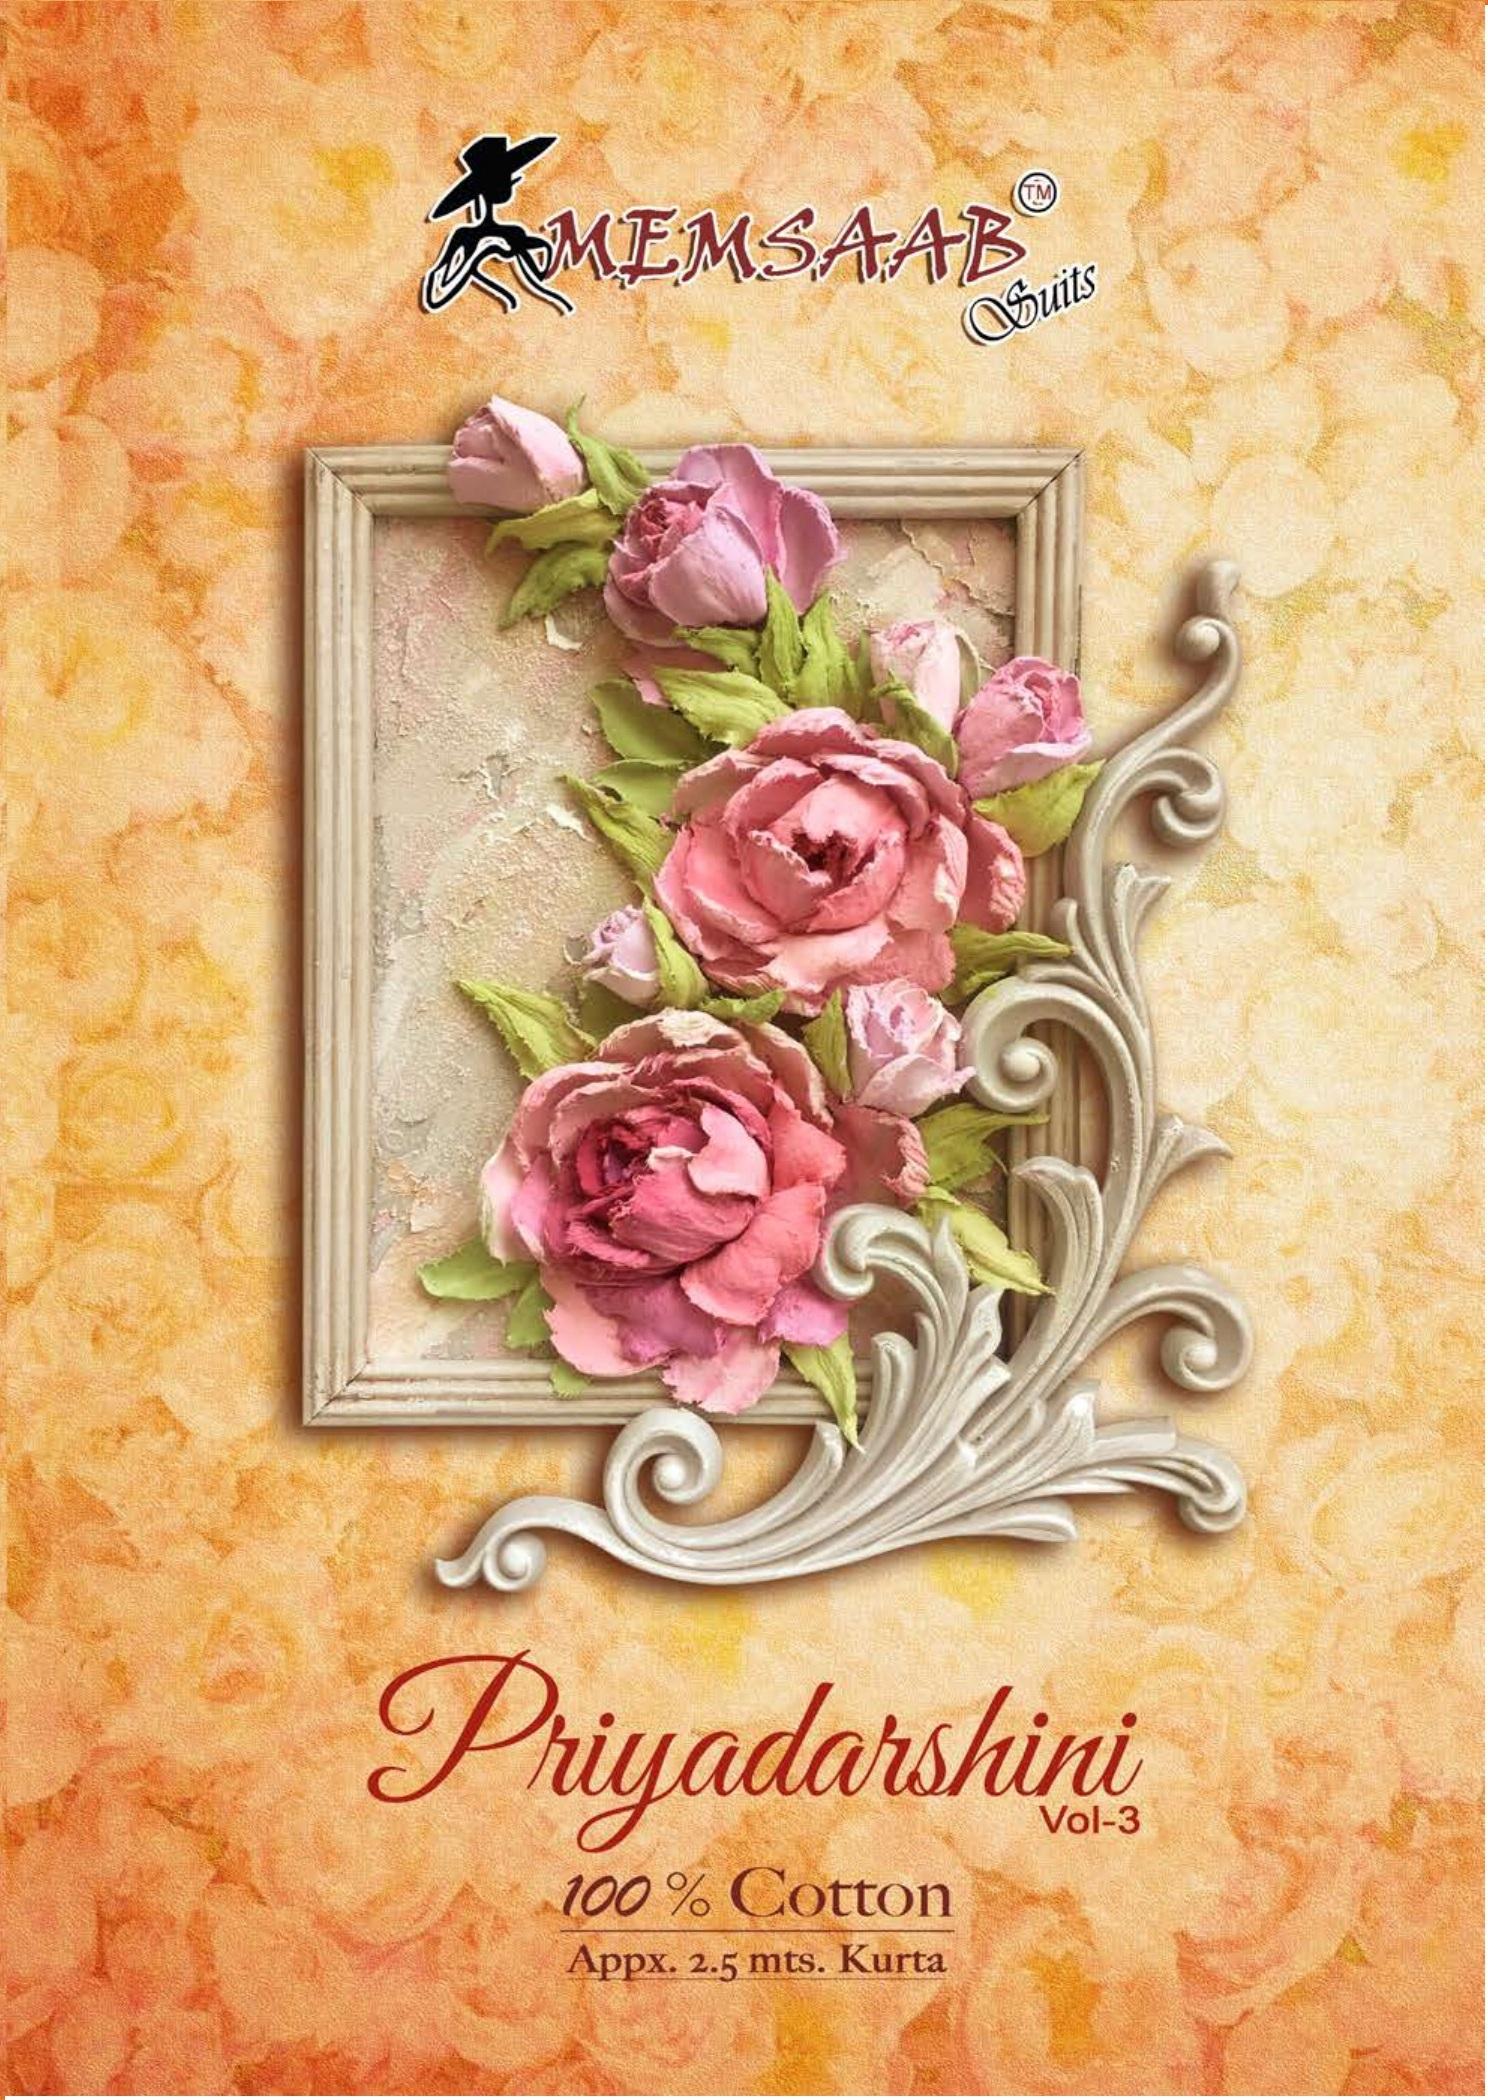 Memsaab-Priyadarshini-vol-3_page-0001